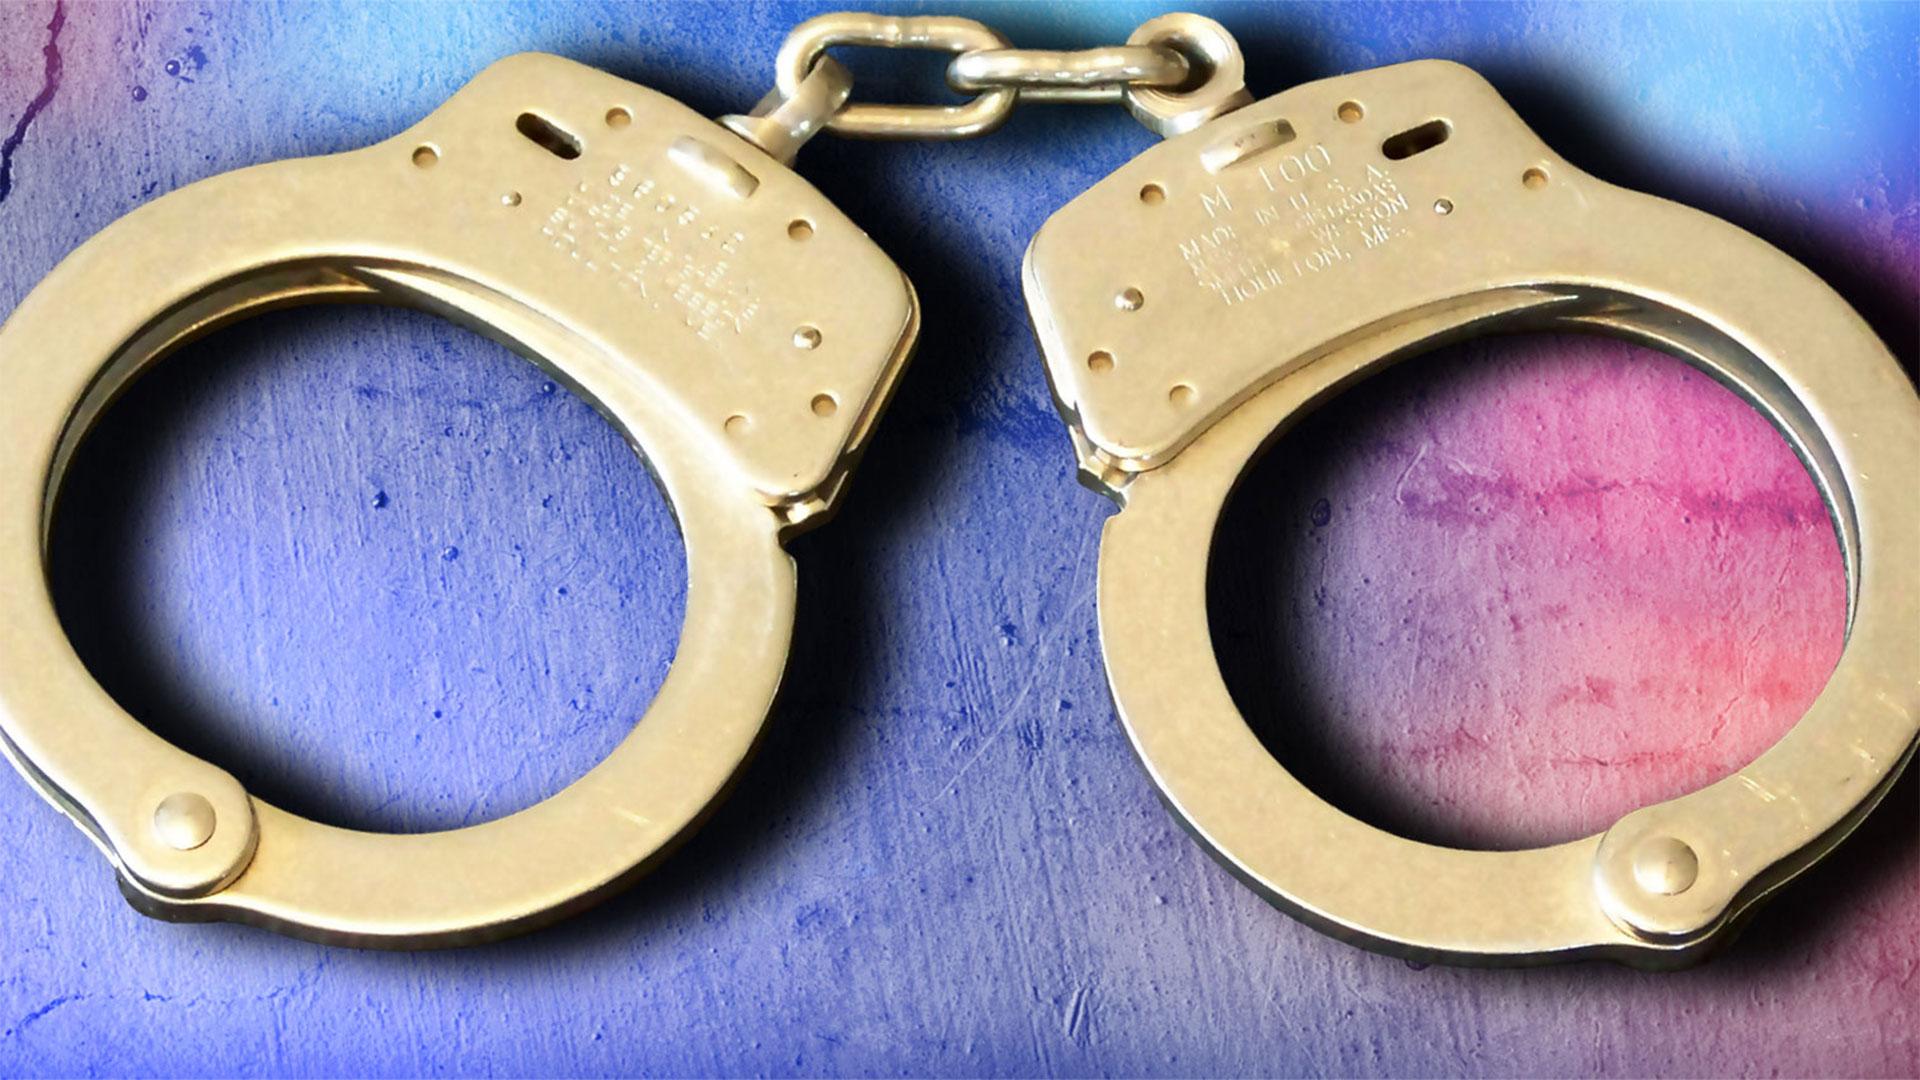 KELO handcuffs crime